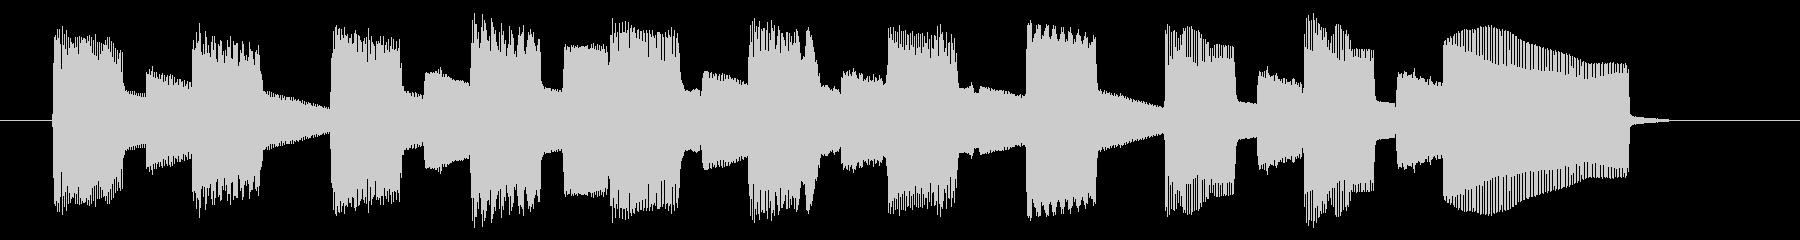 NES スポーツ A03-1(クリア1)の未再生の波形